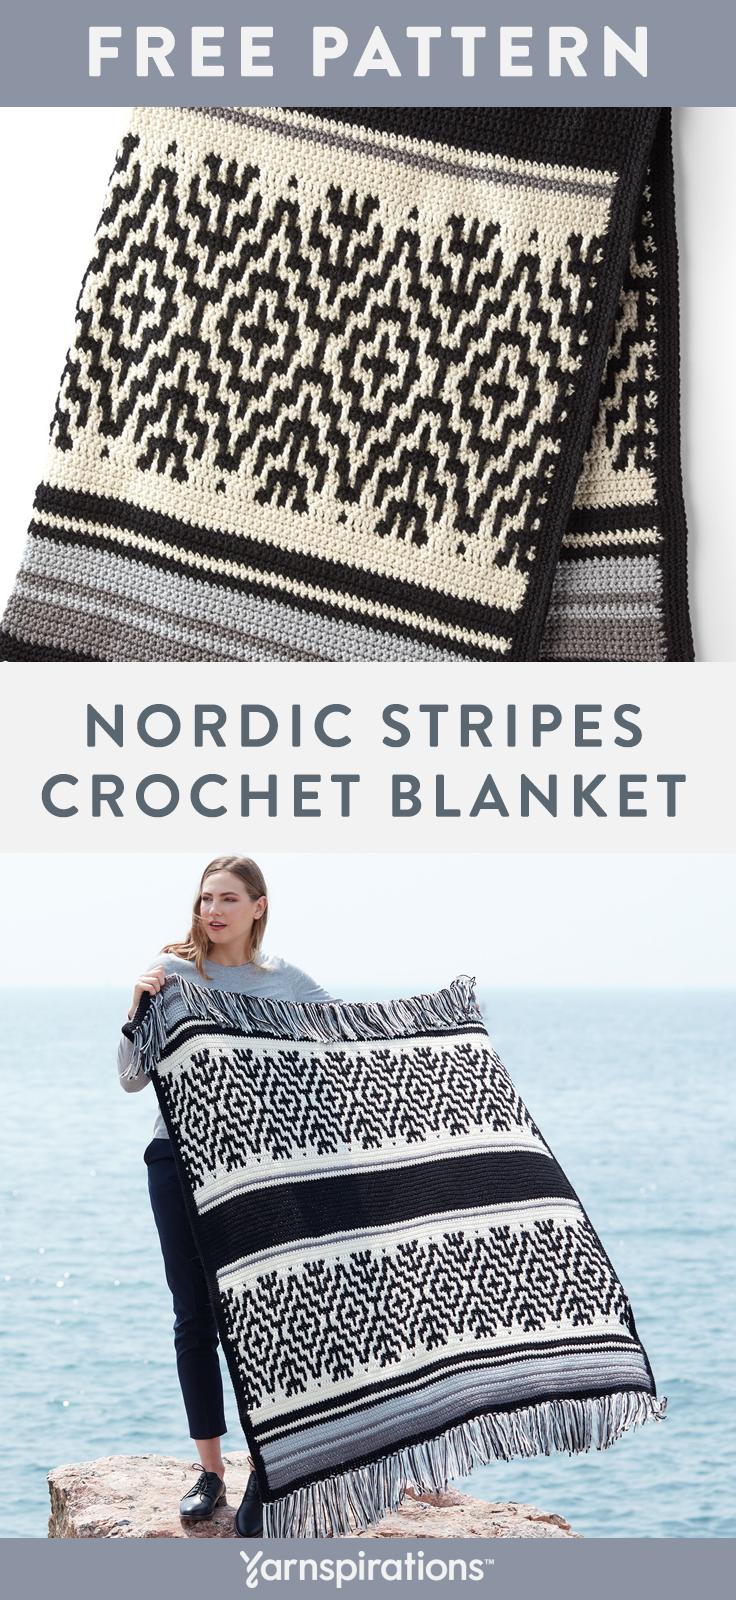 #crochethooks